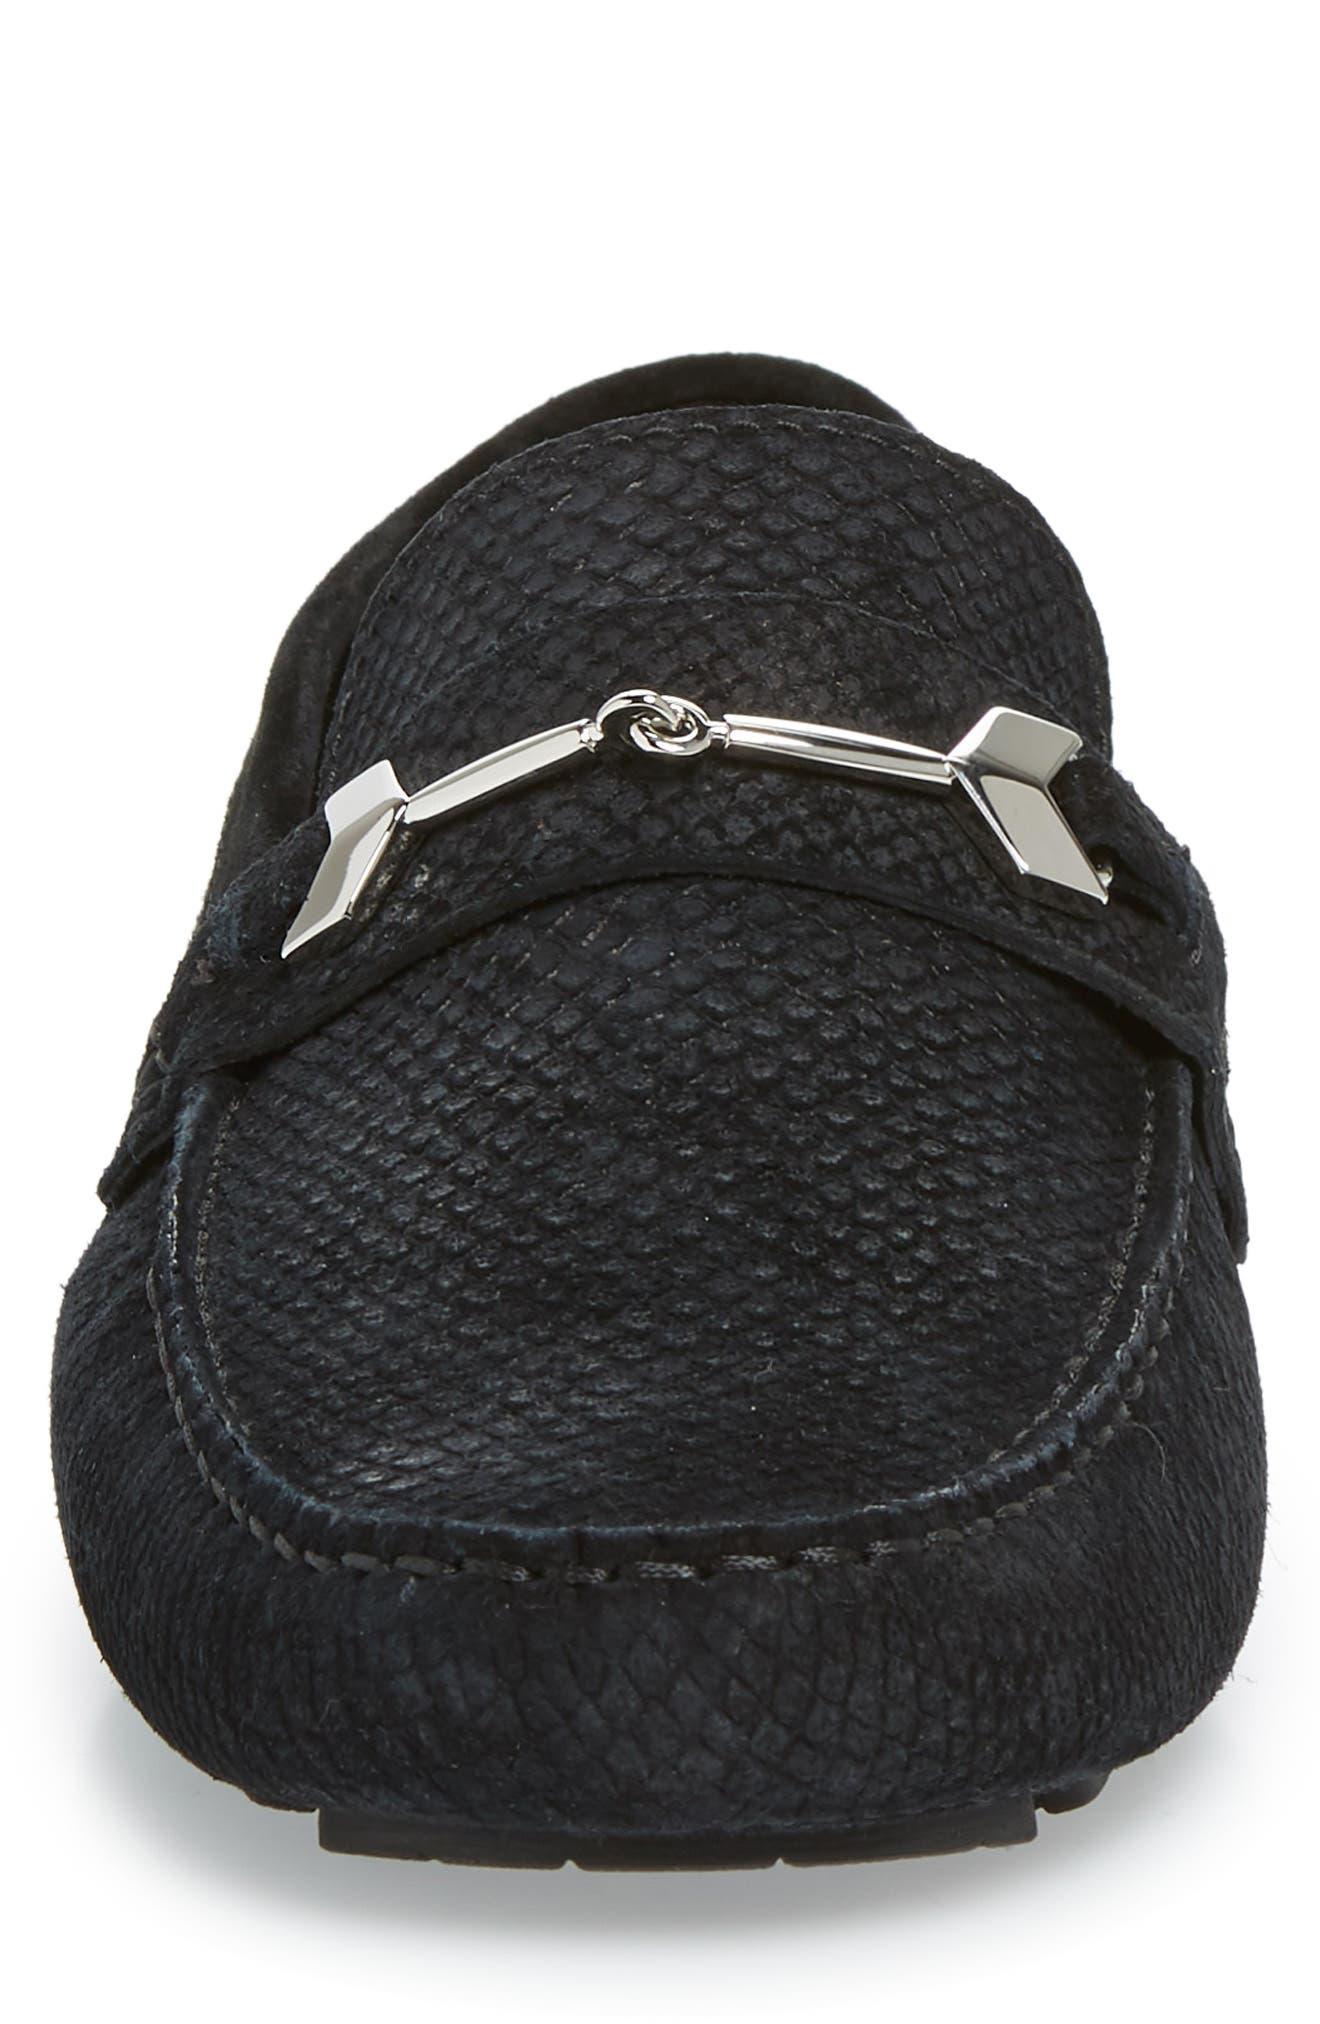 Brewer Croc Textured Driving Loafer,                             Alternate thumbnail 4, color,                             BLACK/BLACK